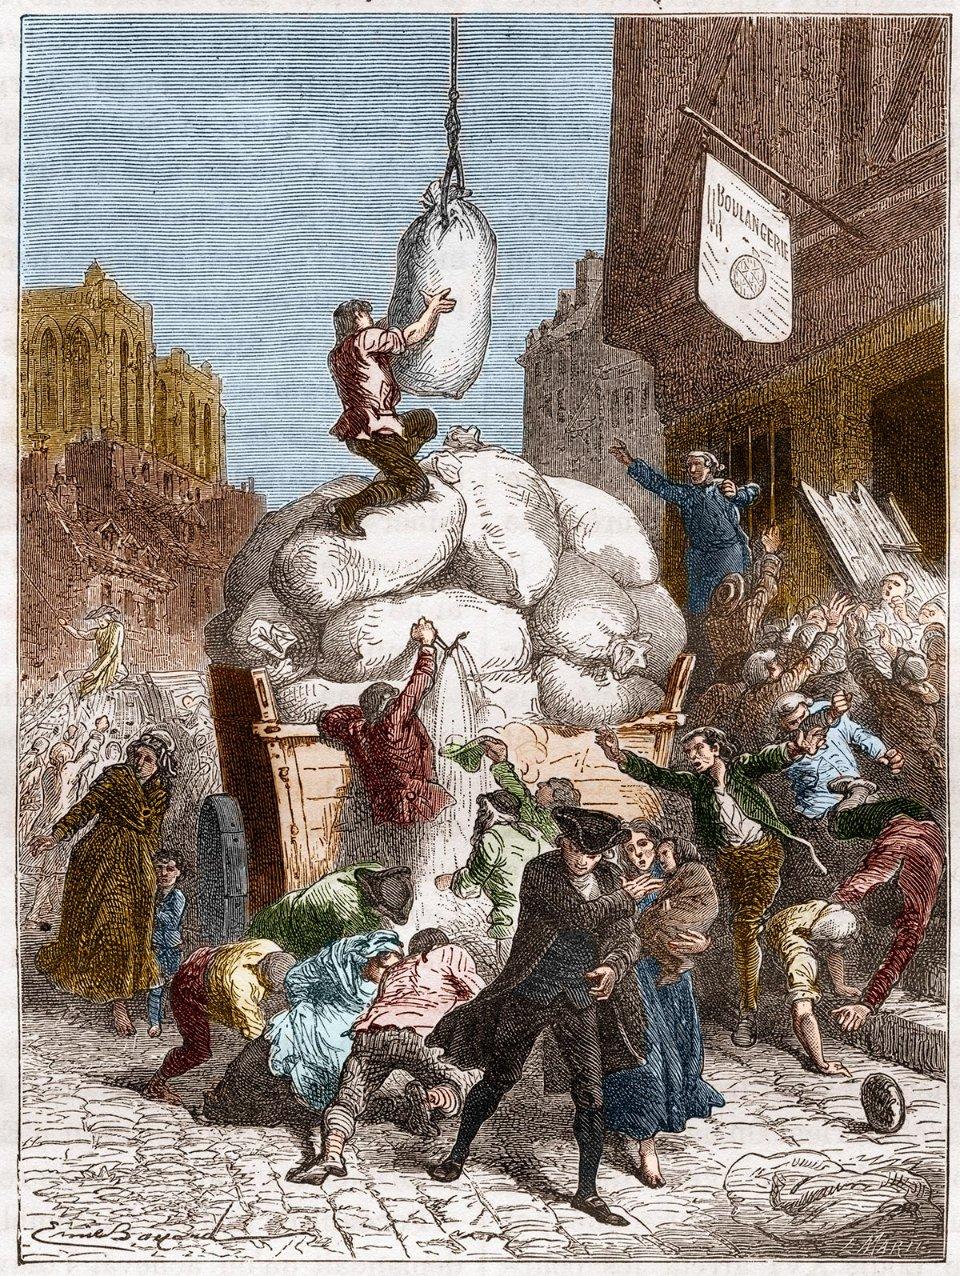 Французи б'ються за мішки з зерном. Ілюстрація кінця ХІХ століття / Getty Images